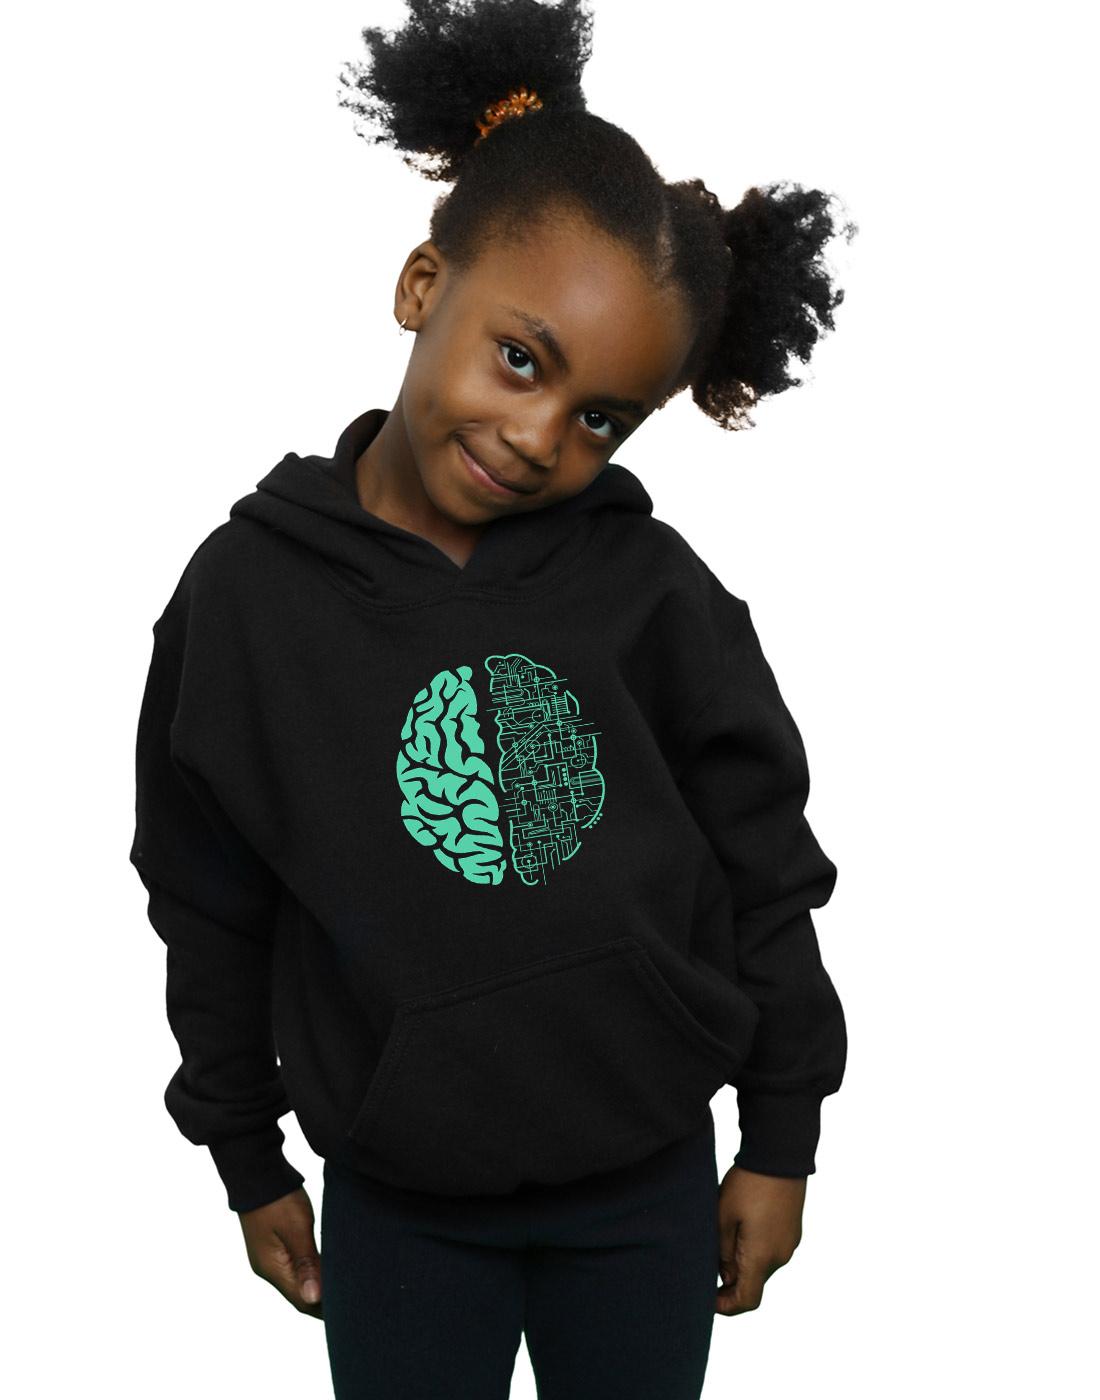 Absolute Cult Drewbacca Girls Electric Brain Sweatshirt